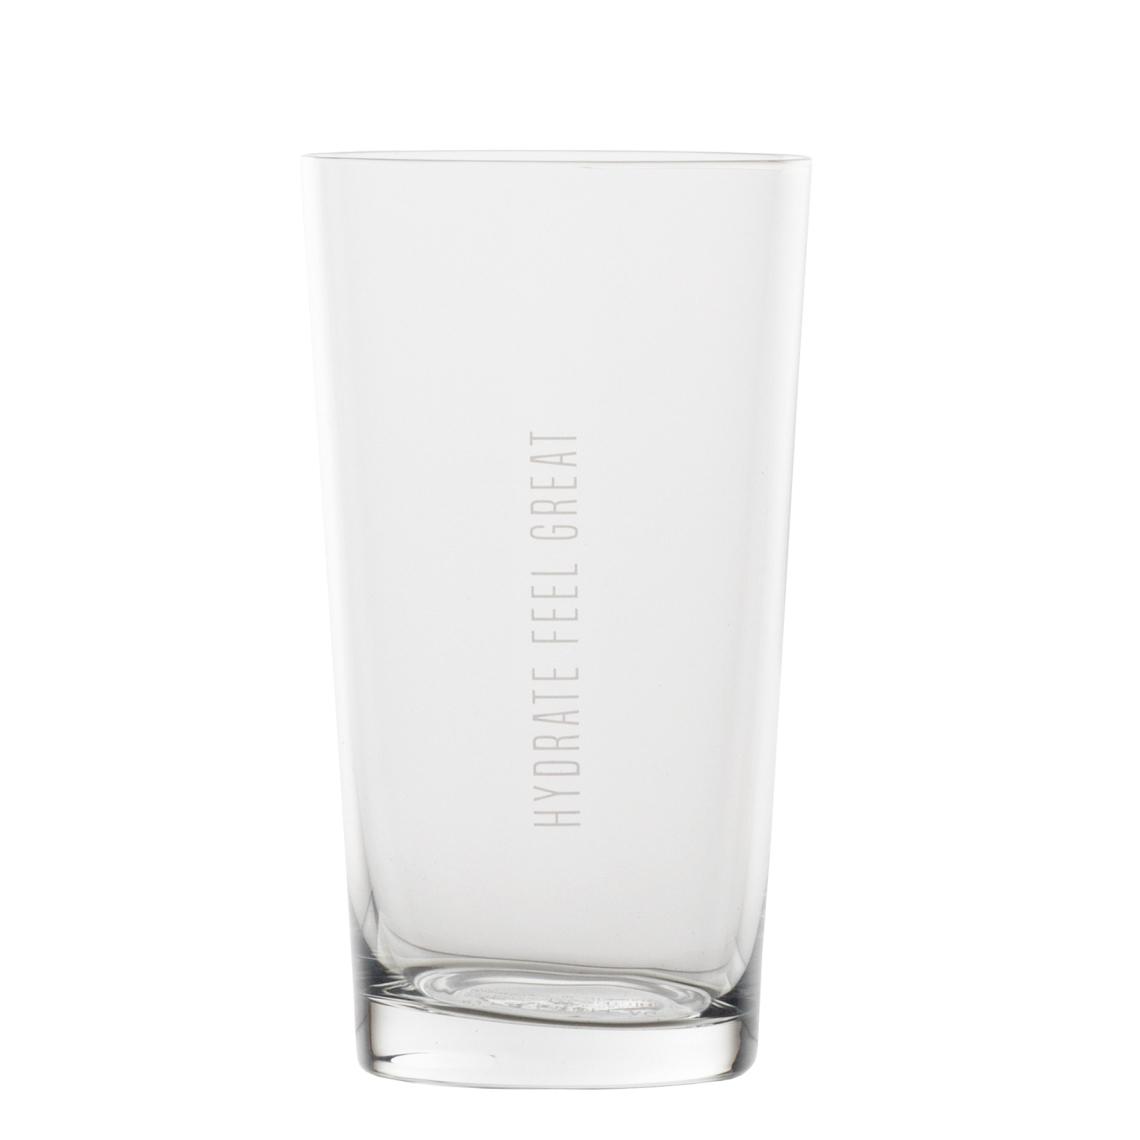 "Wasserglas - ""Hydrate feel great"" - räder"